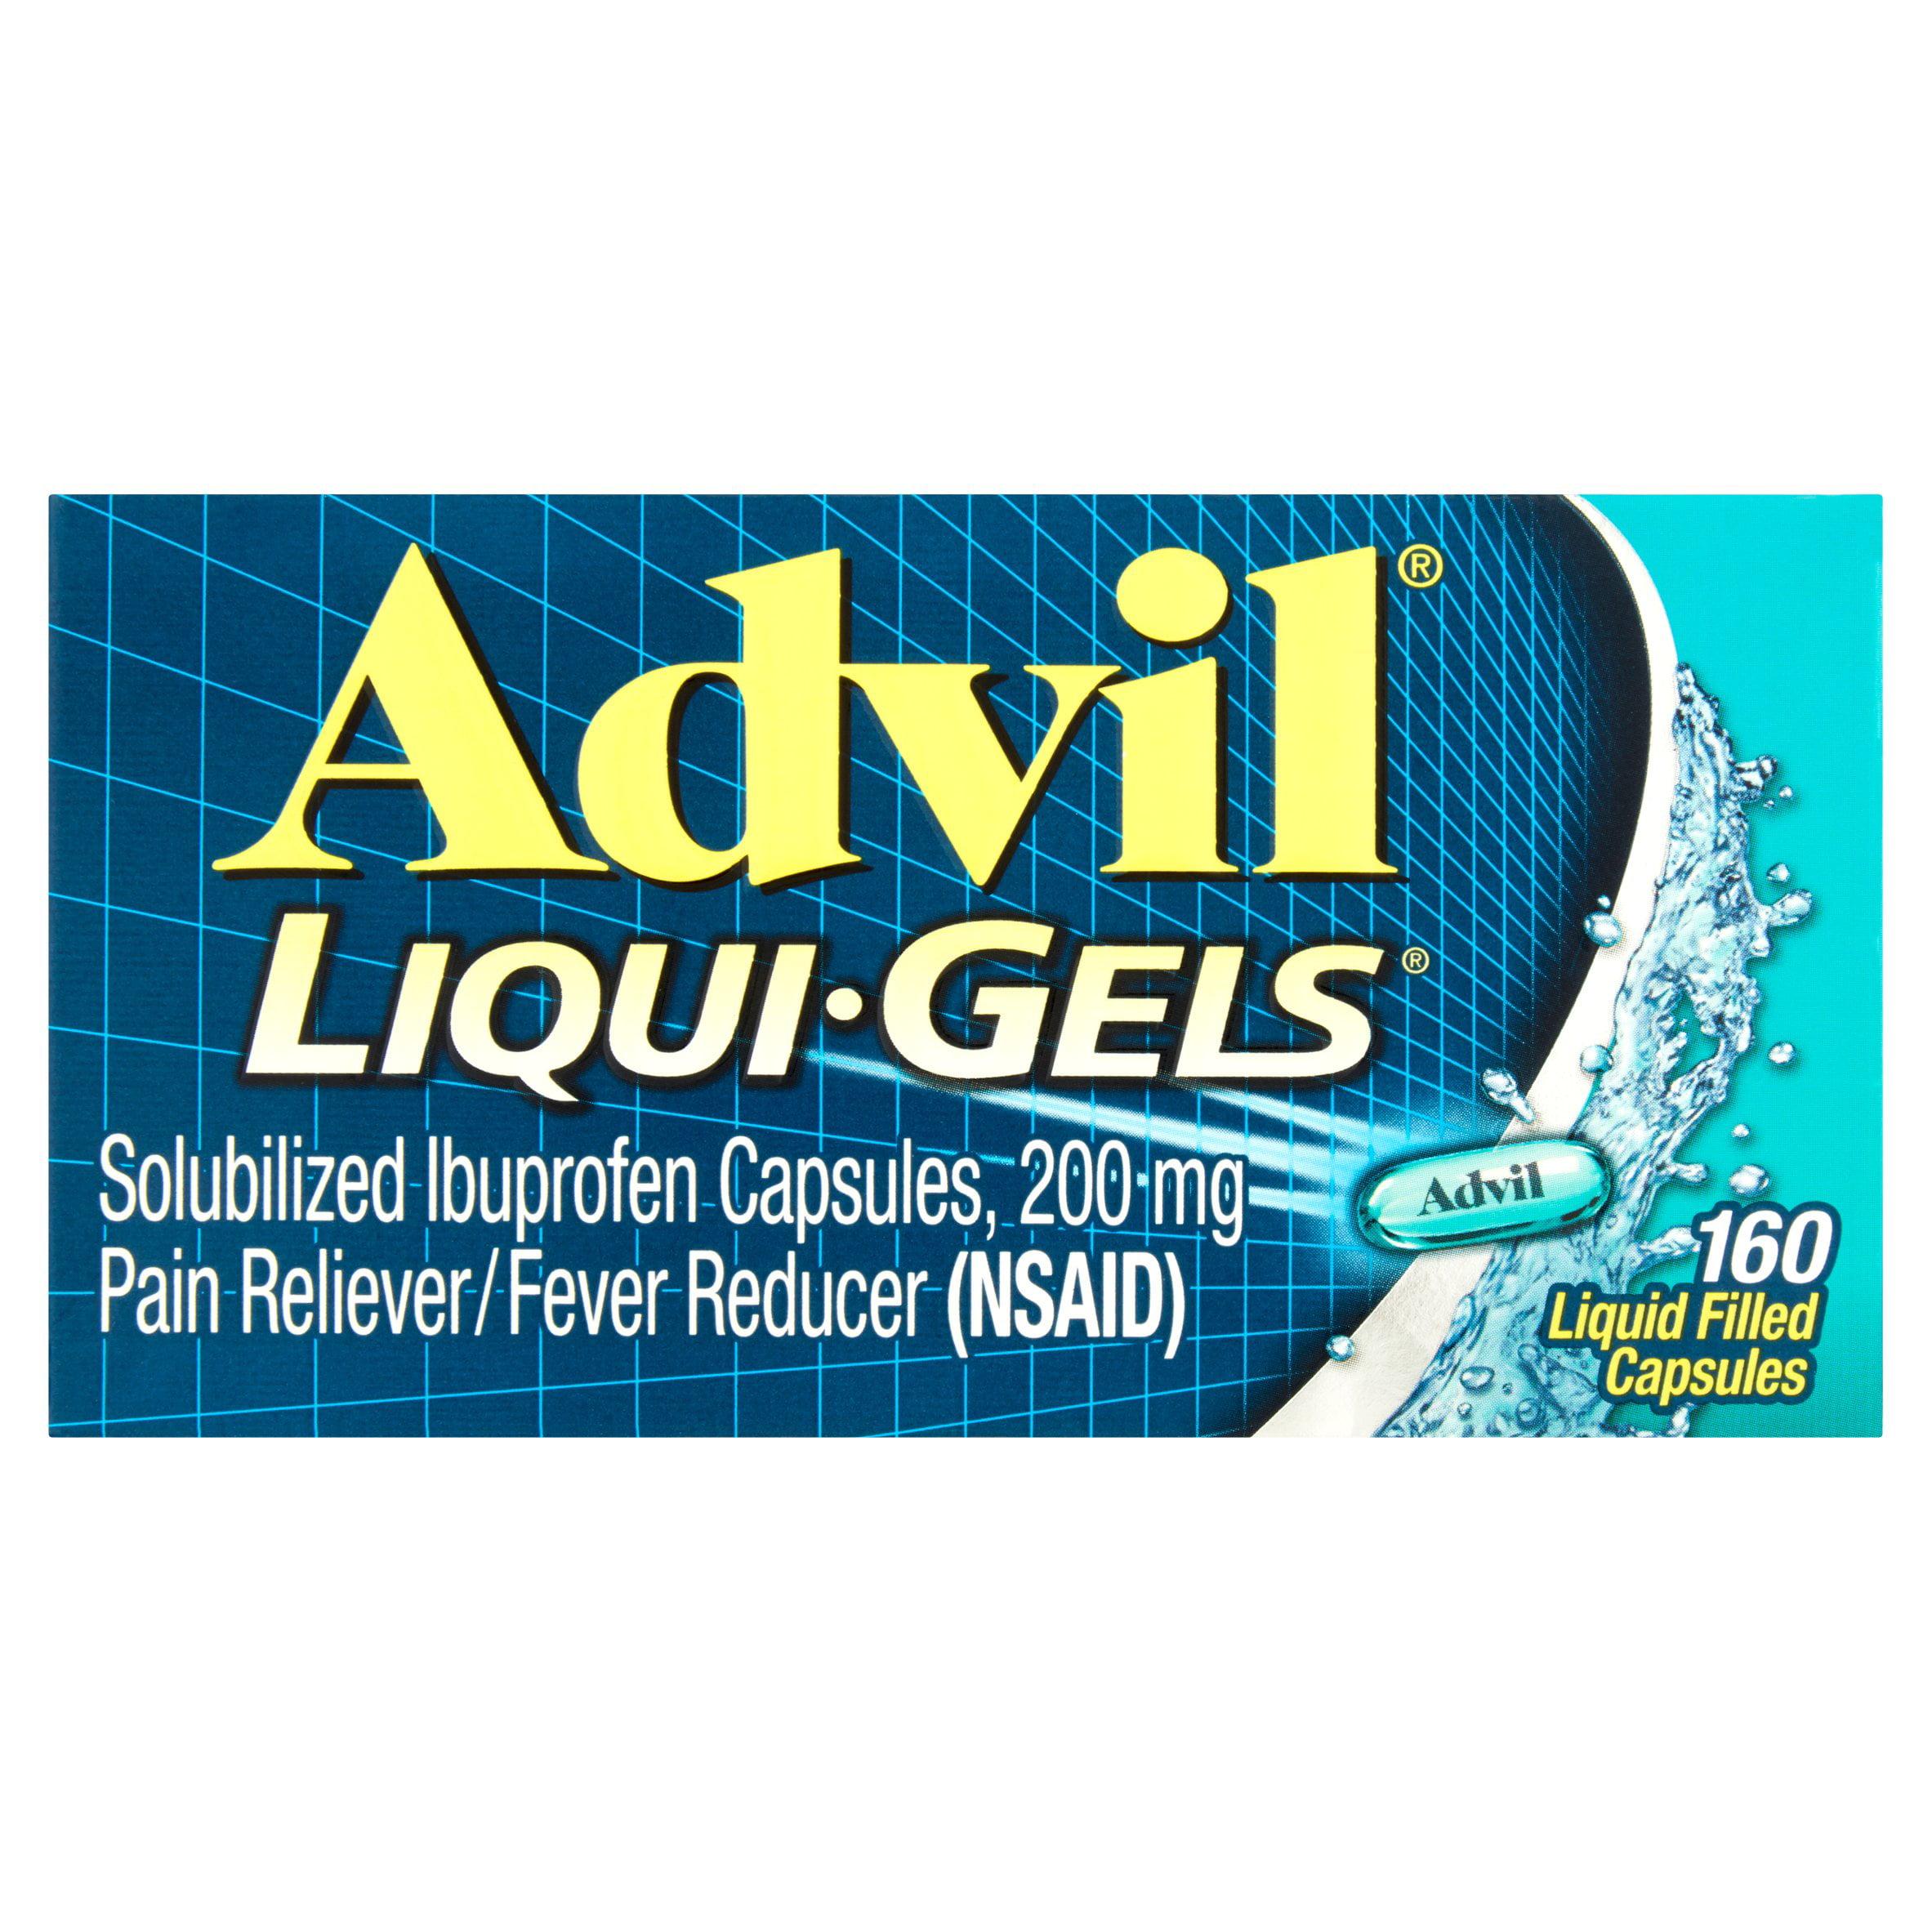 Advil Liqui-Gels (160 Count) Pain Reliever / Fever Reducer Liquid Filled Capsule, 200mg Ibuprofen, Temporary Pain Relief